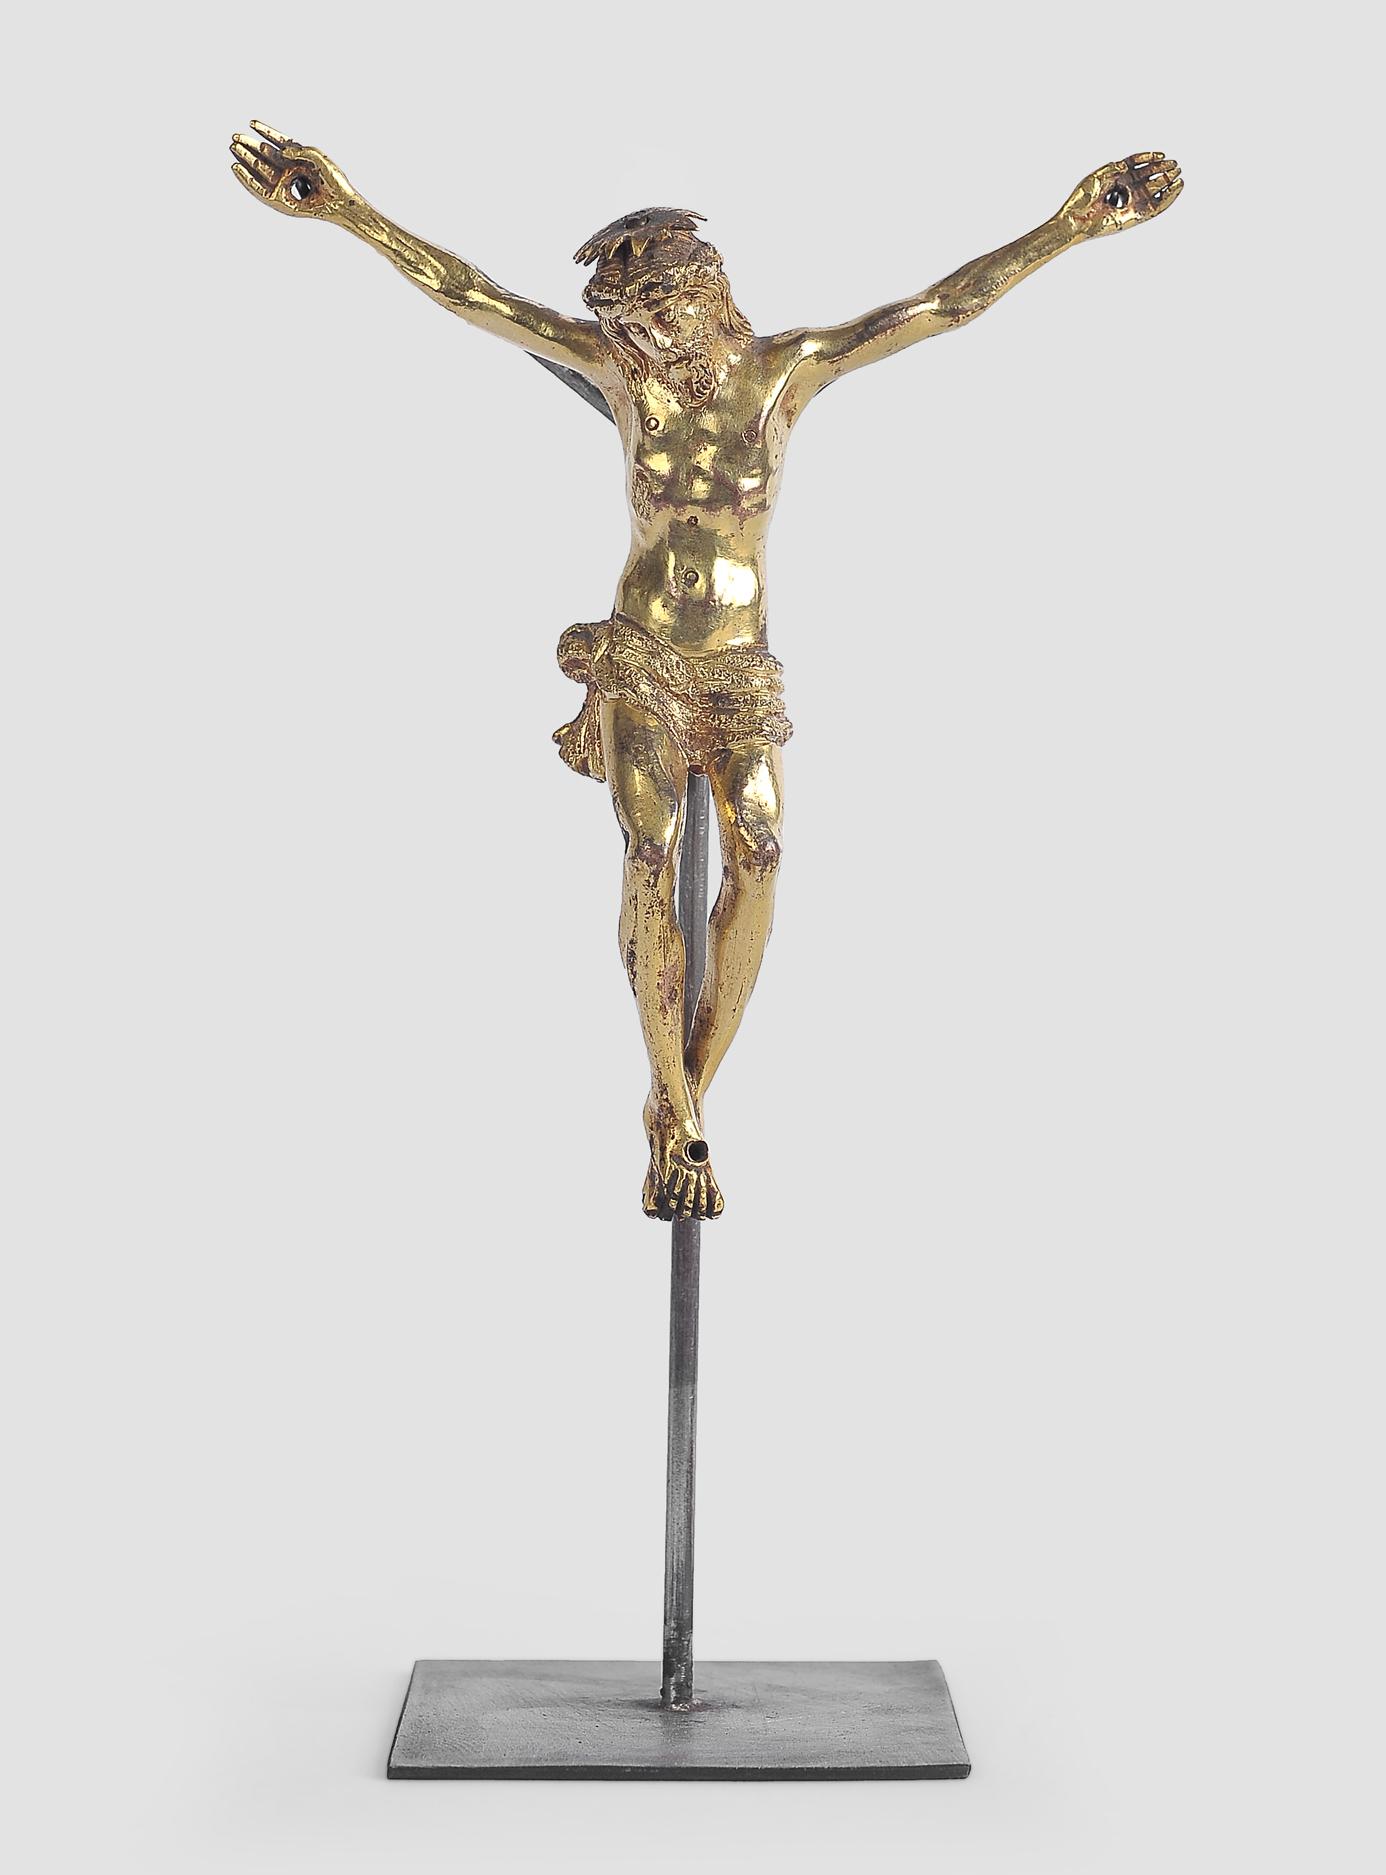 Corpus Christi, Süddeutsch oder Italien, 17. Jahrhundert, Bronze - Image 2 of 5